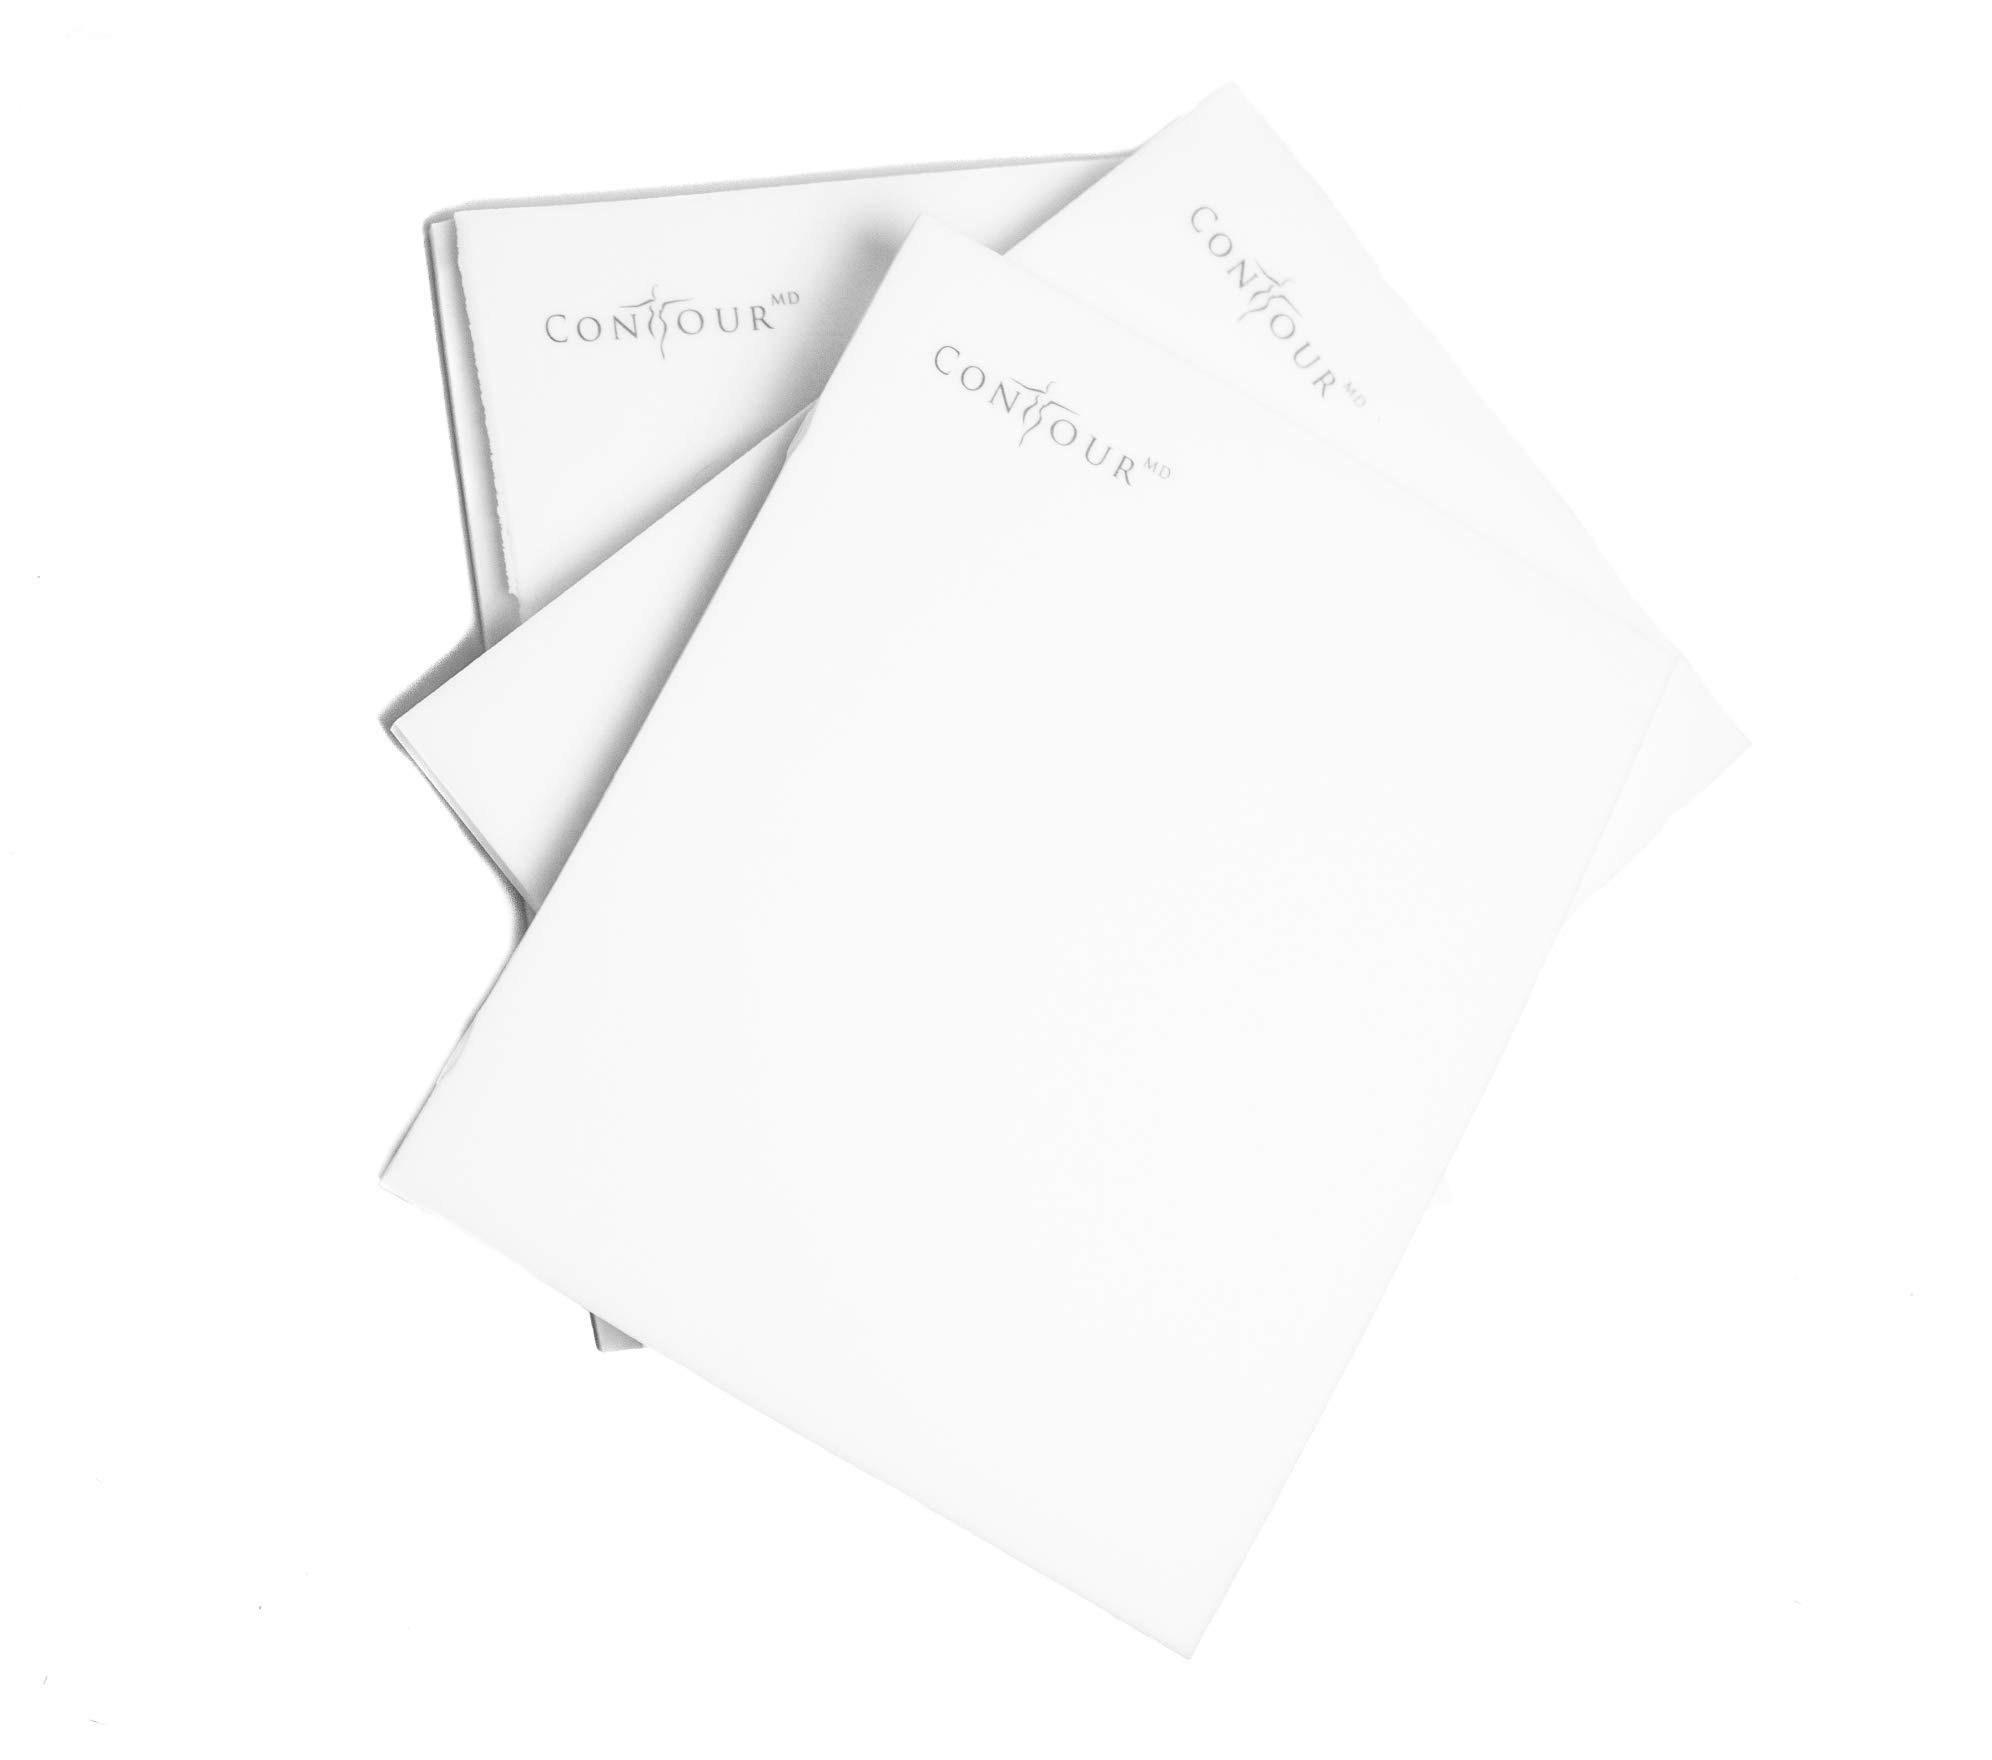 Post Surgery Foam Sheets, Surgical Compression Garments ContourMD, 8''x 11'' Sheet (Lipo-1), 3 Sheet White by Contour